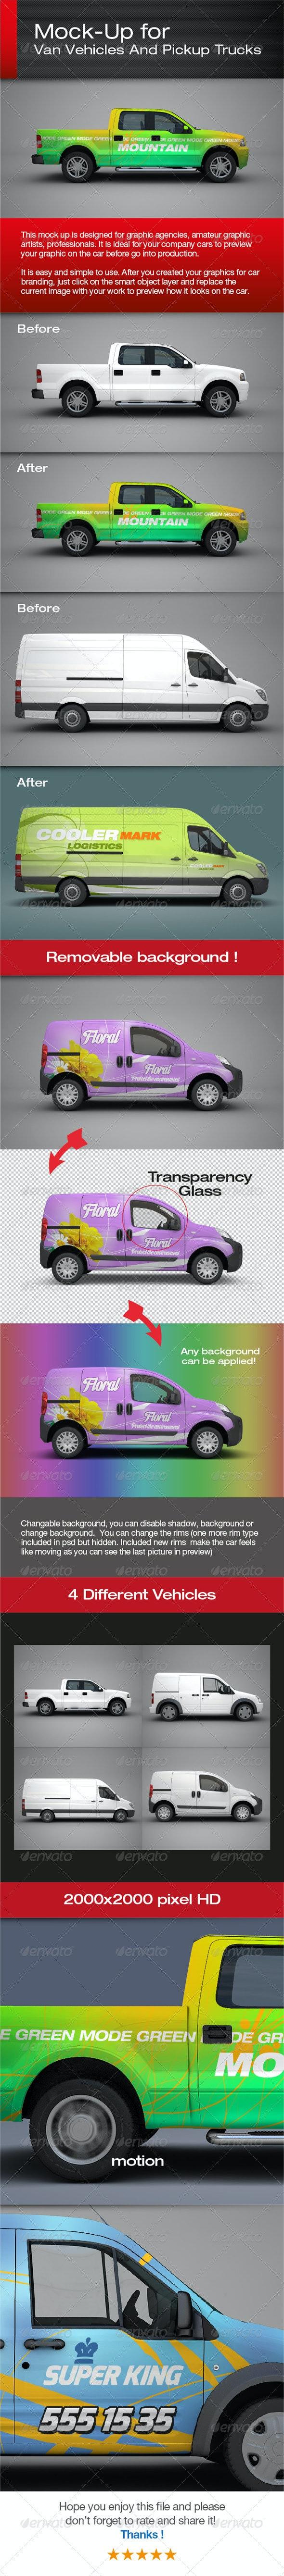 Van Vehicles And Pickup Trucks Mock-Up - Vehicle Wraps Print